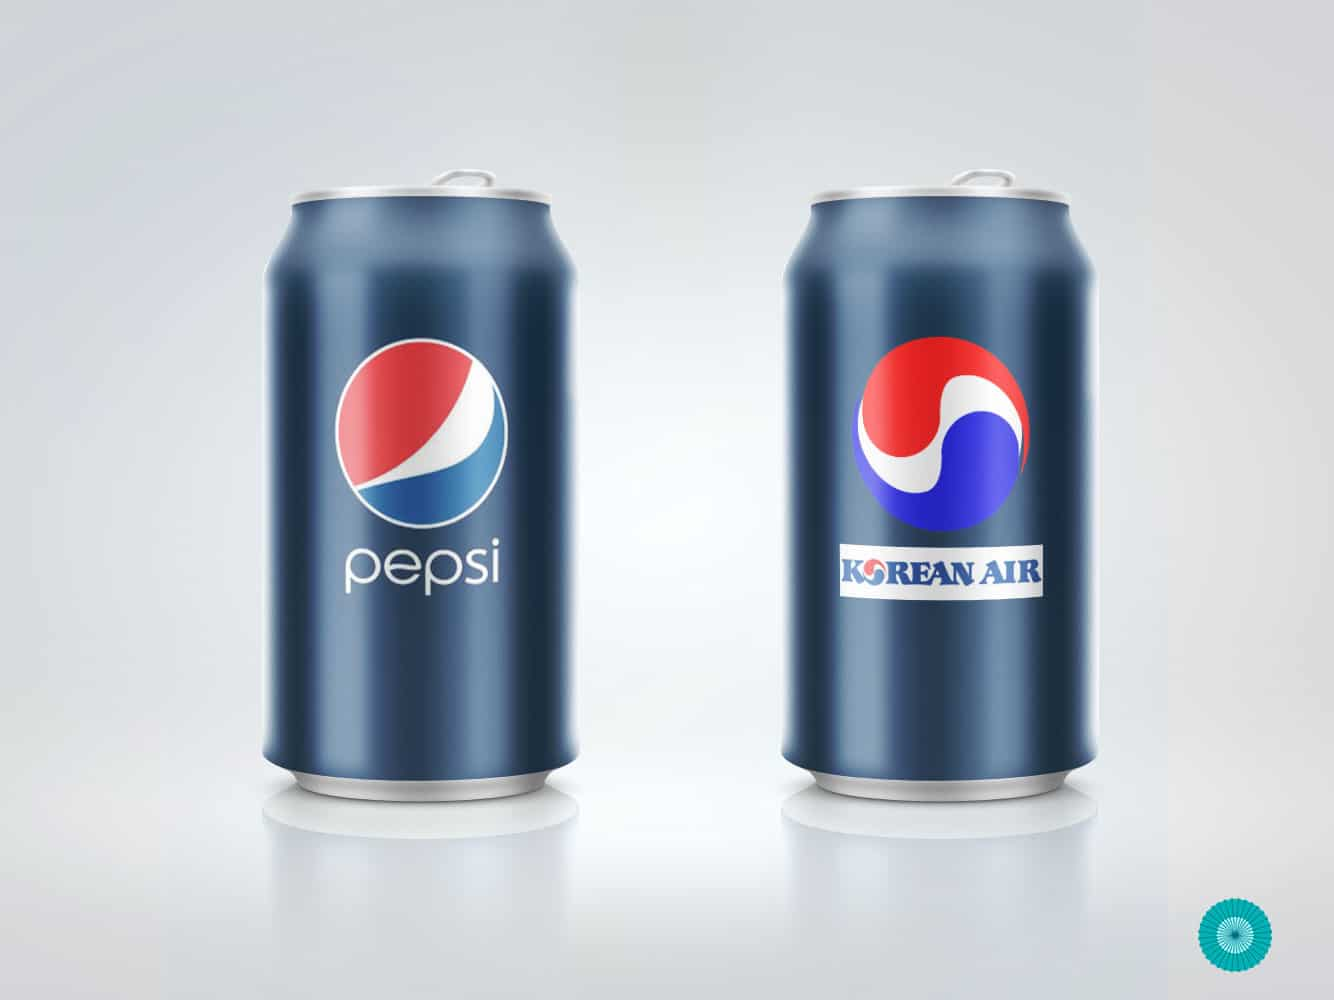 importancia de un buen logo